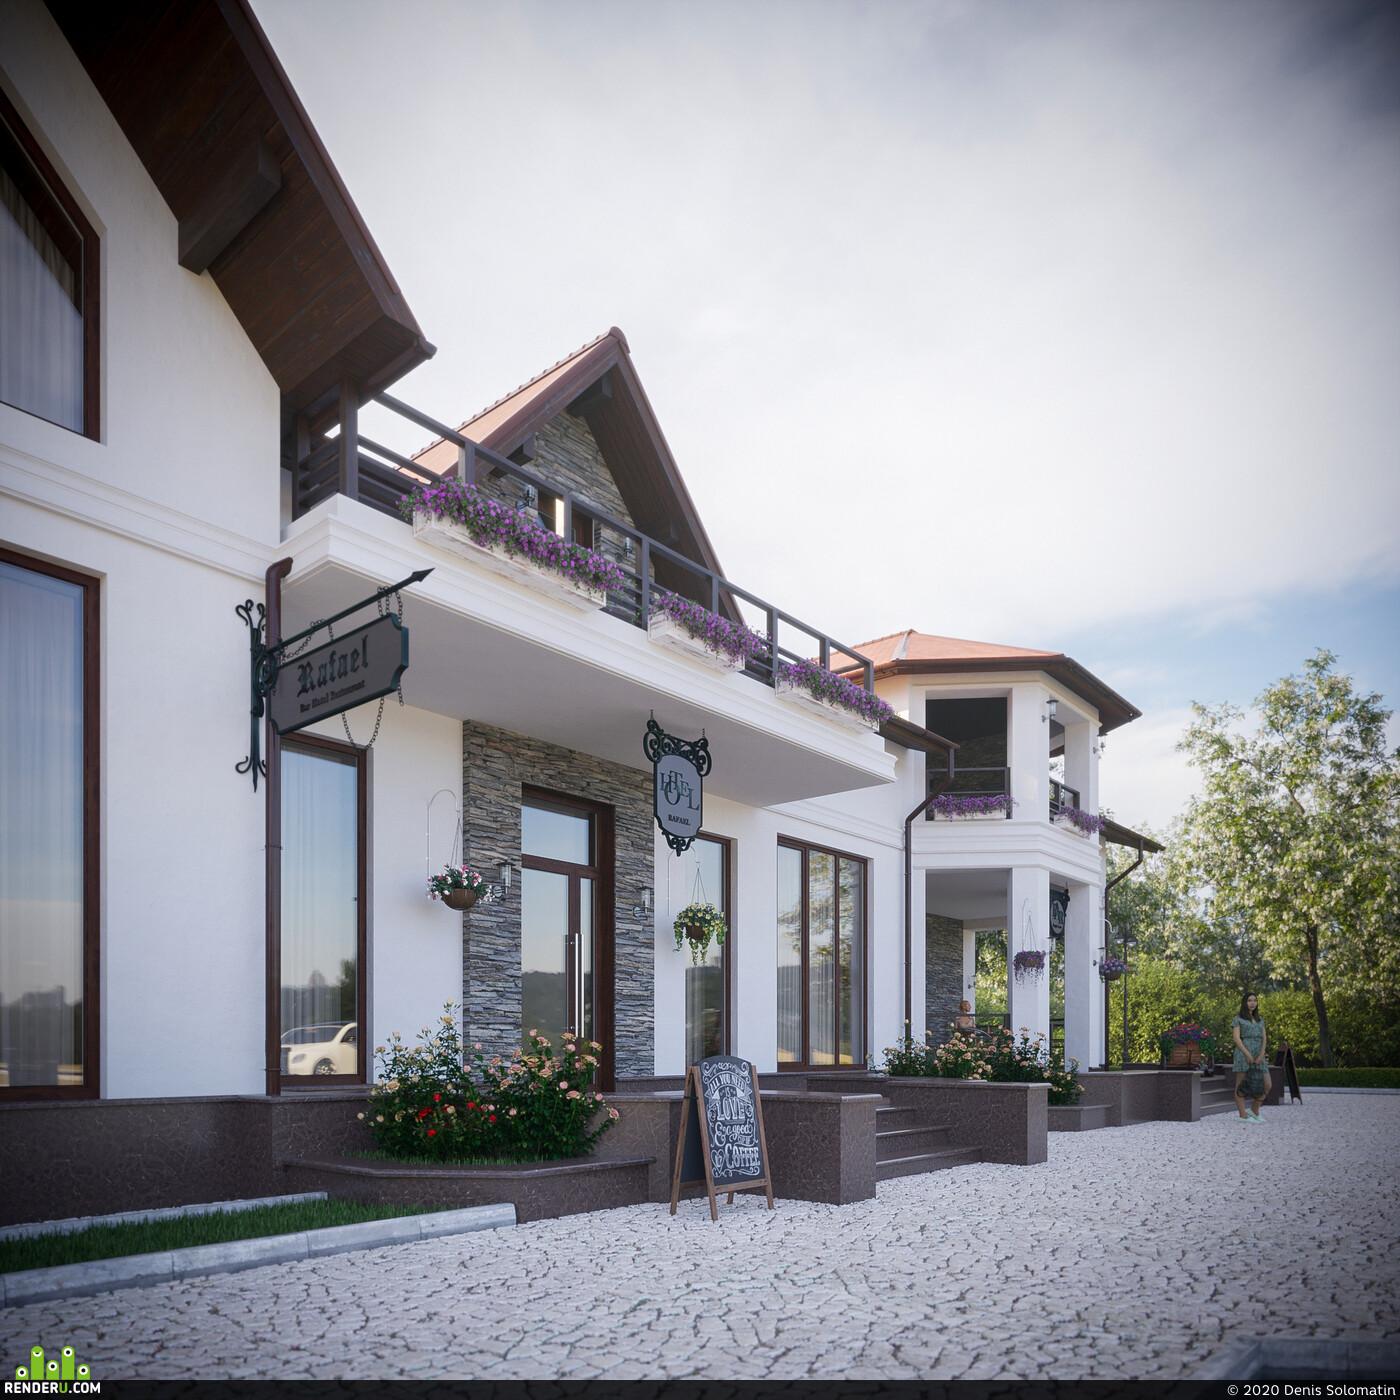 Exterior, 3d exterior, exterior visualisation, restaurant design, Public building, public space, 3d architecture public building, 3D Architecture, architecture, architectural visualization